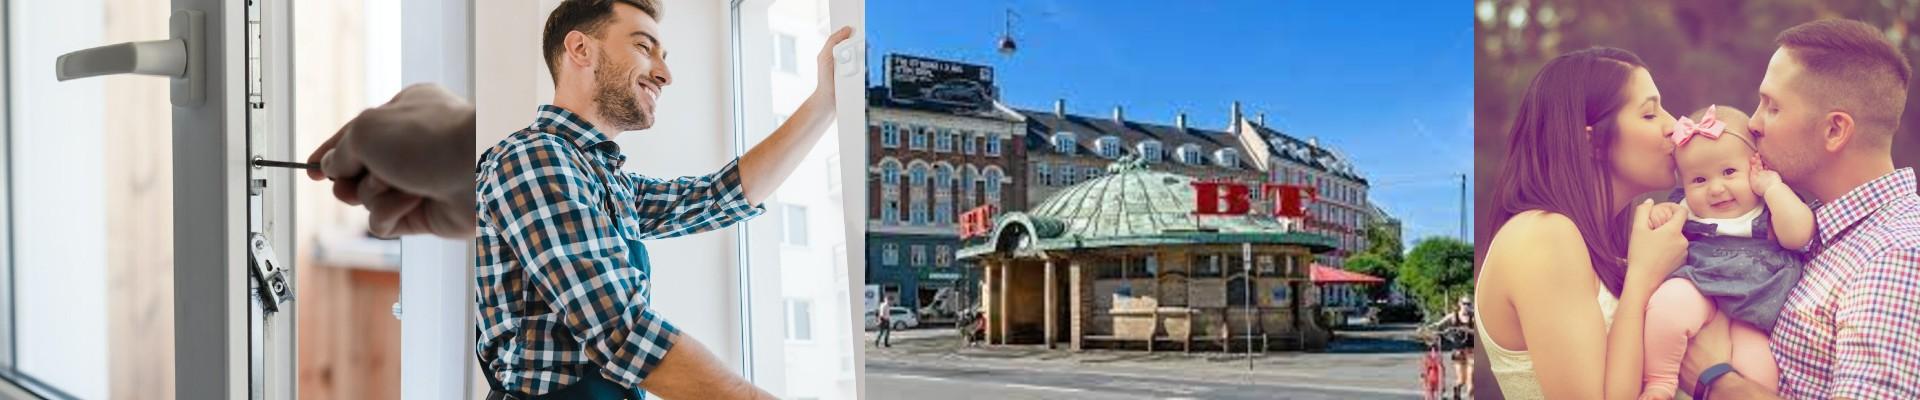 Låsesmed Østerbro, døgnvagt låse 24/7